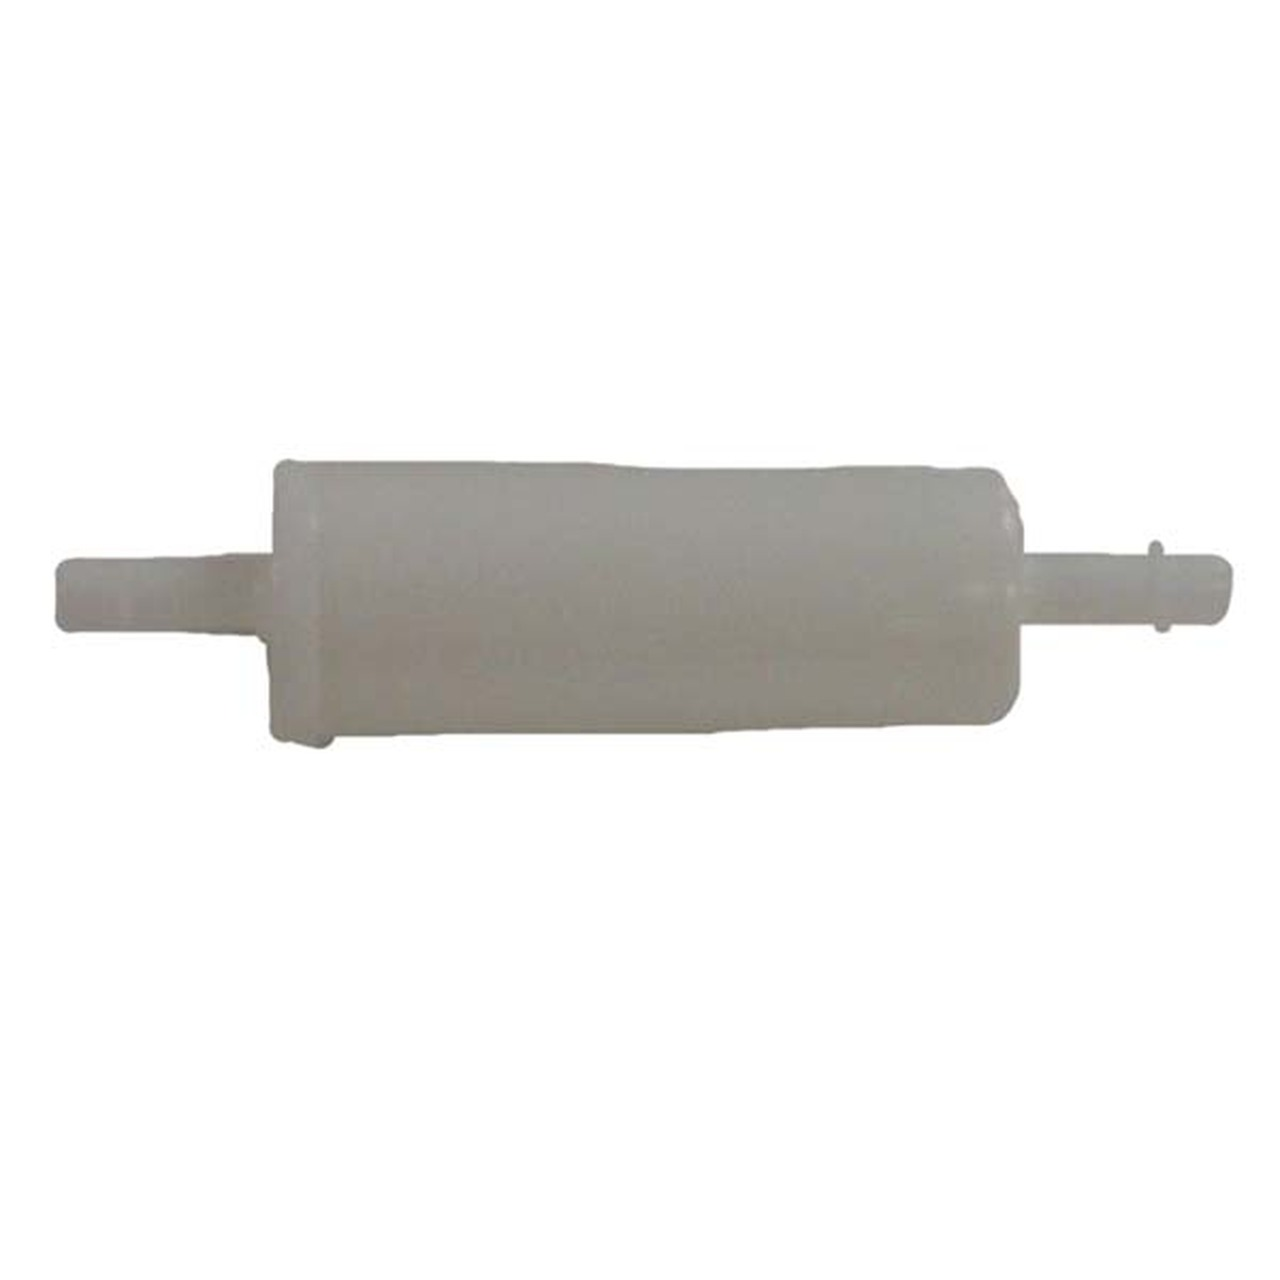 Universal Fuel Filter Kit 18-7790